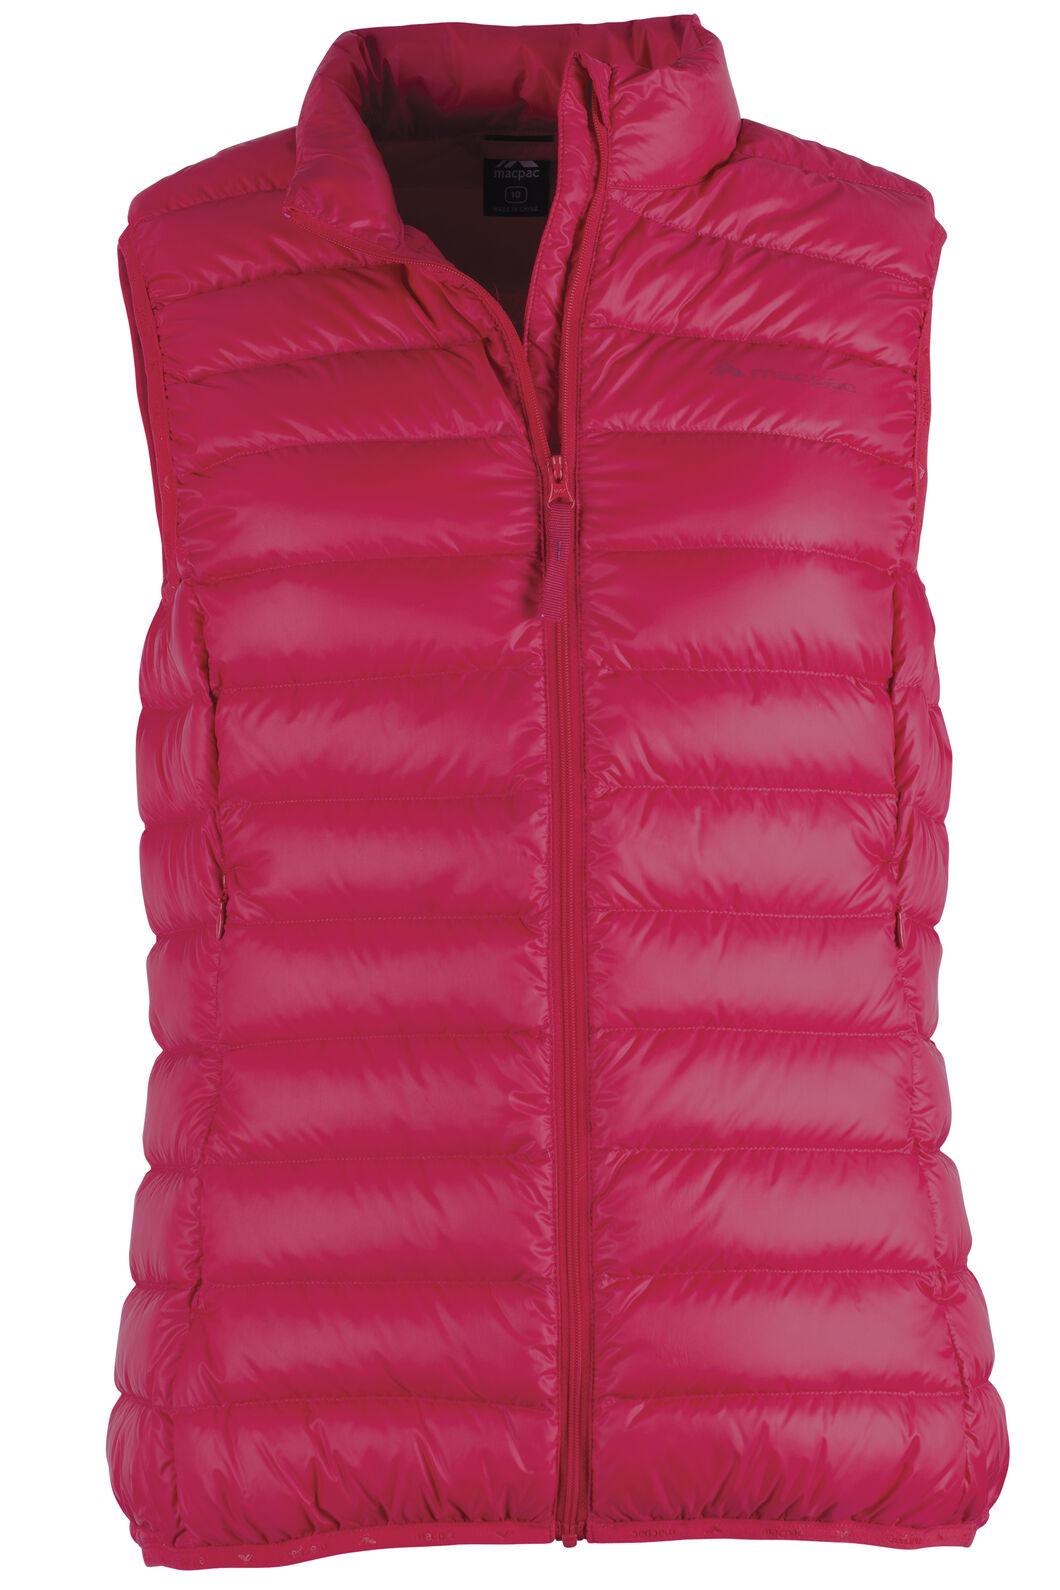 Macpac Uber Light Down Vest - Women's, Crimson, hi-res